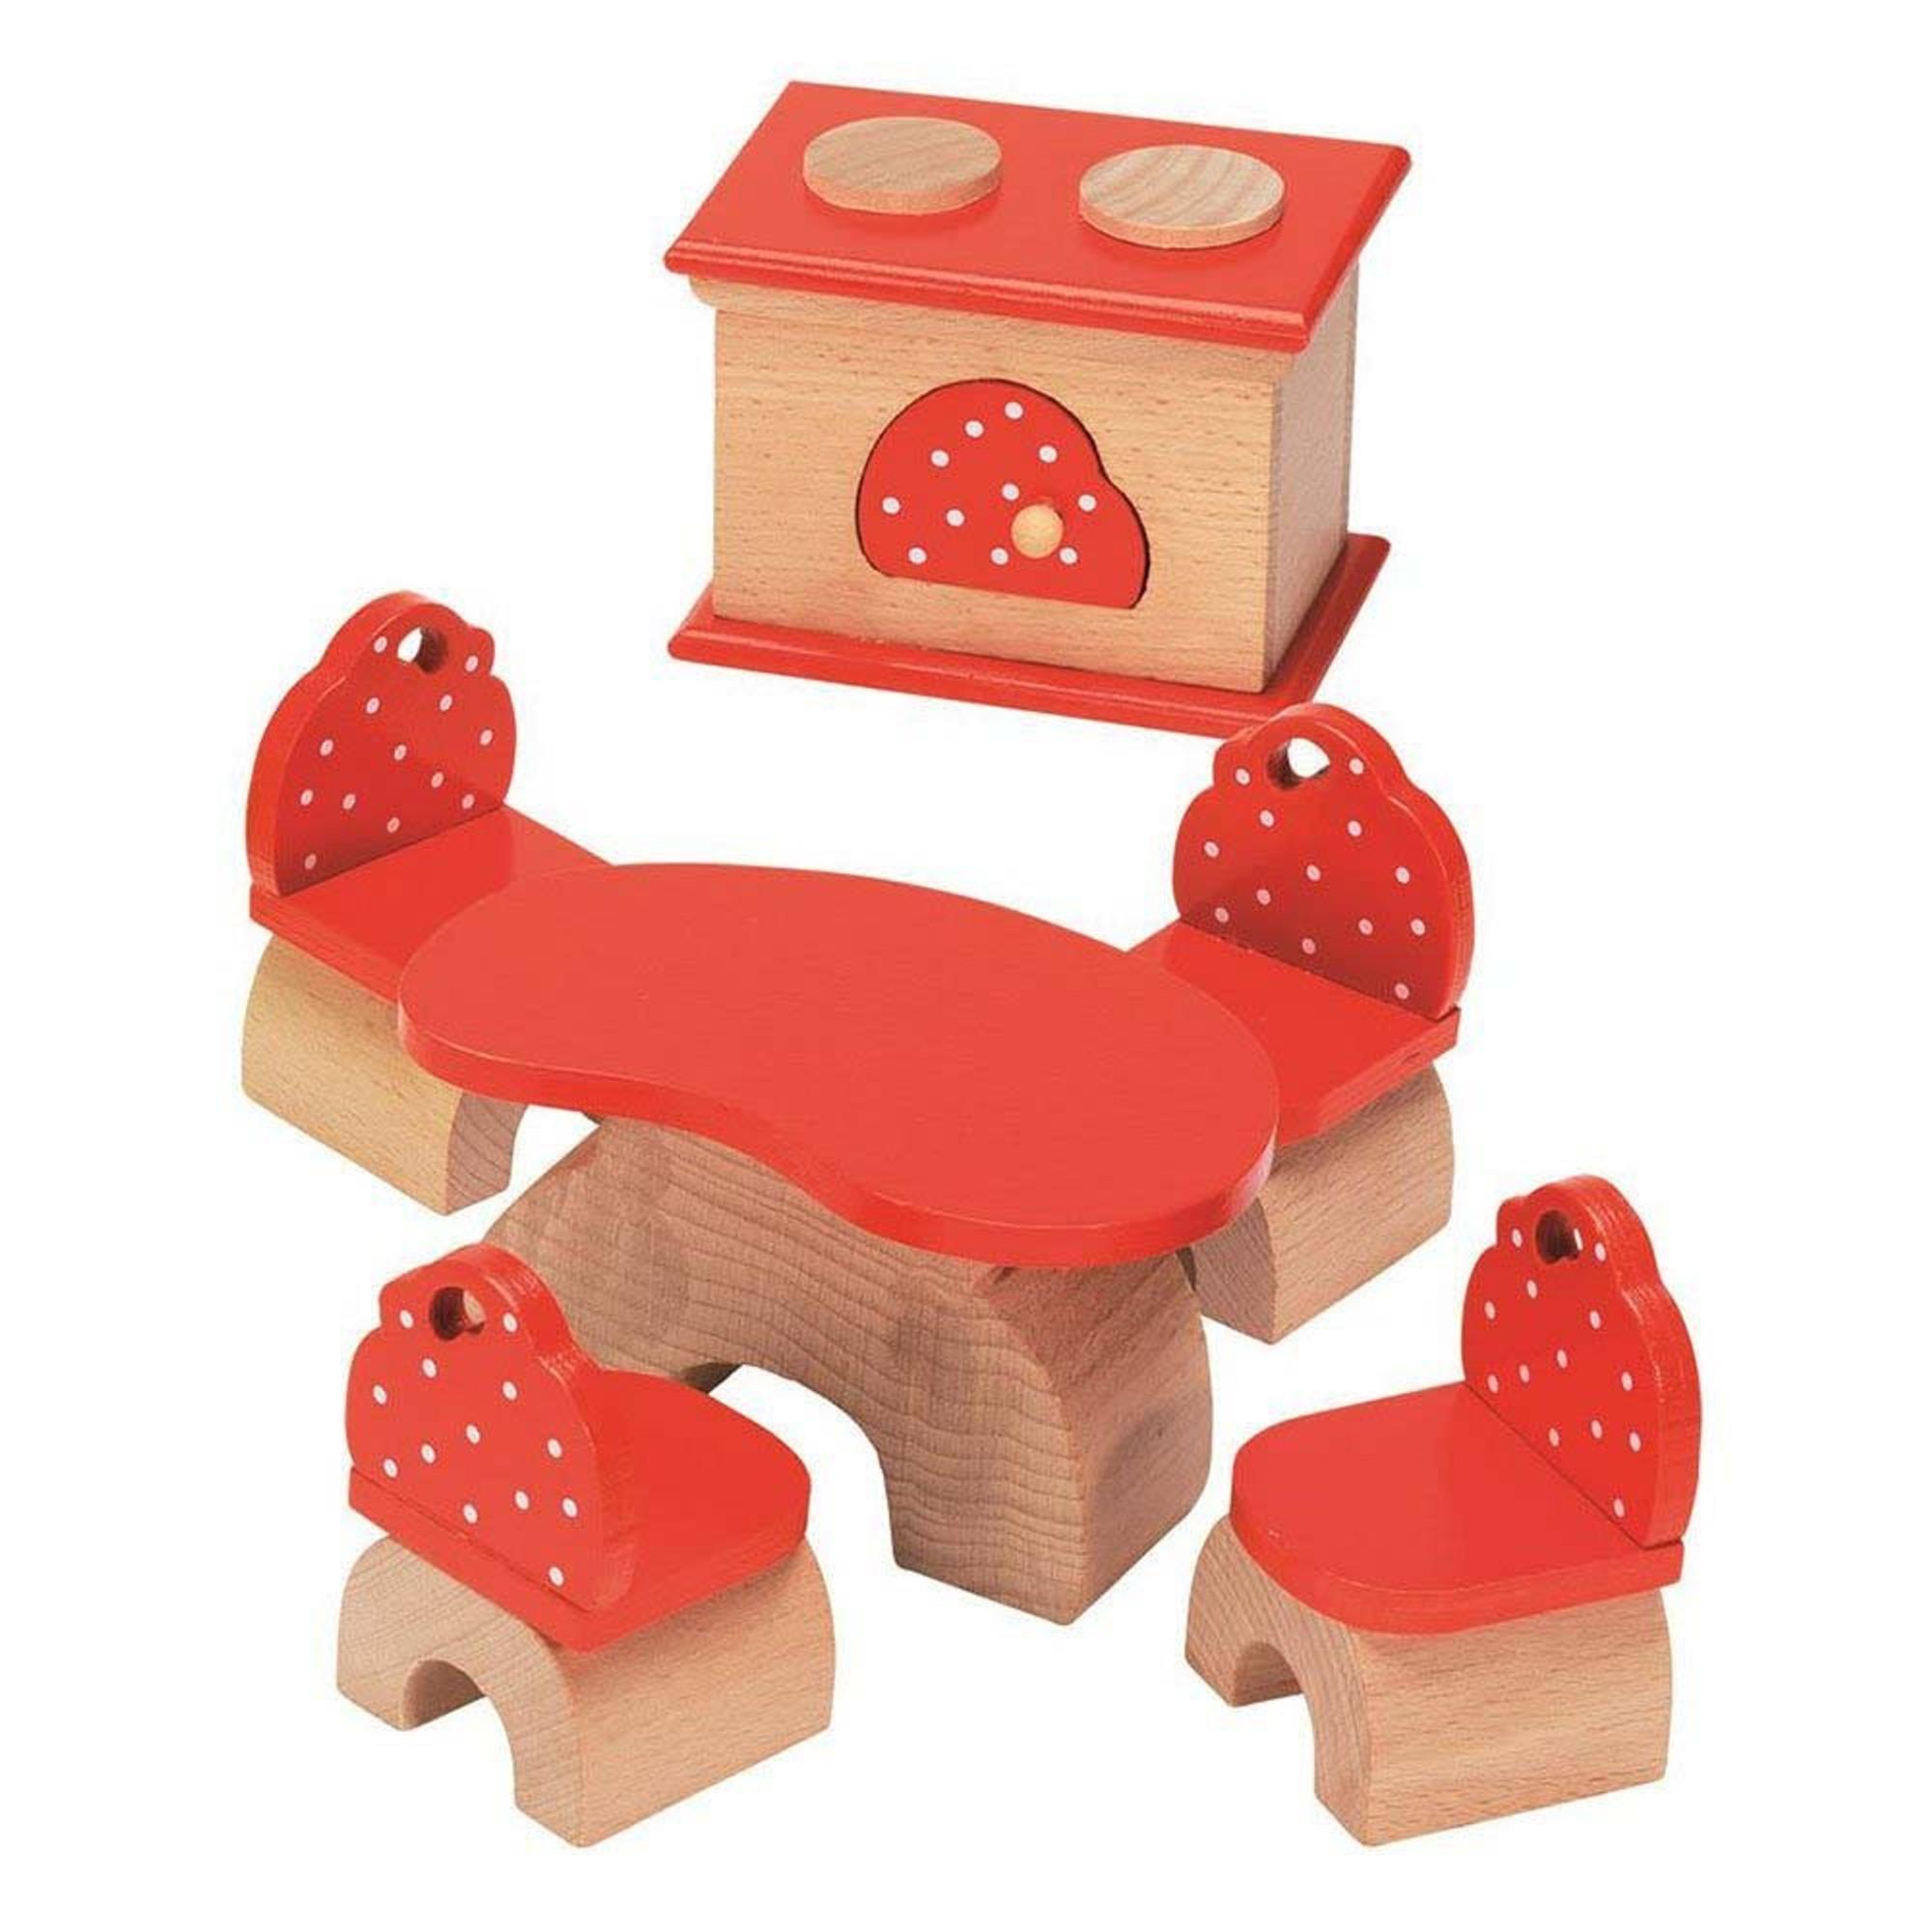 puppenm bel waldhaus puppen zubeh r m bel. Black Bedroom Furniture Sets. Home Design Ideas